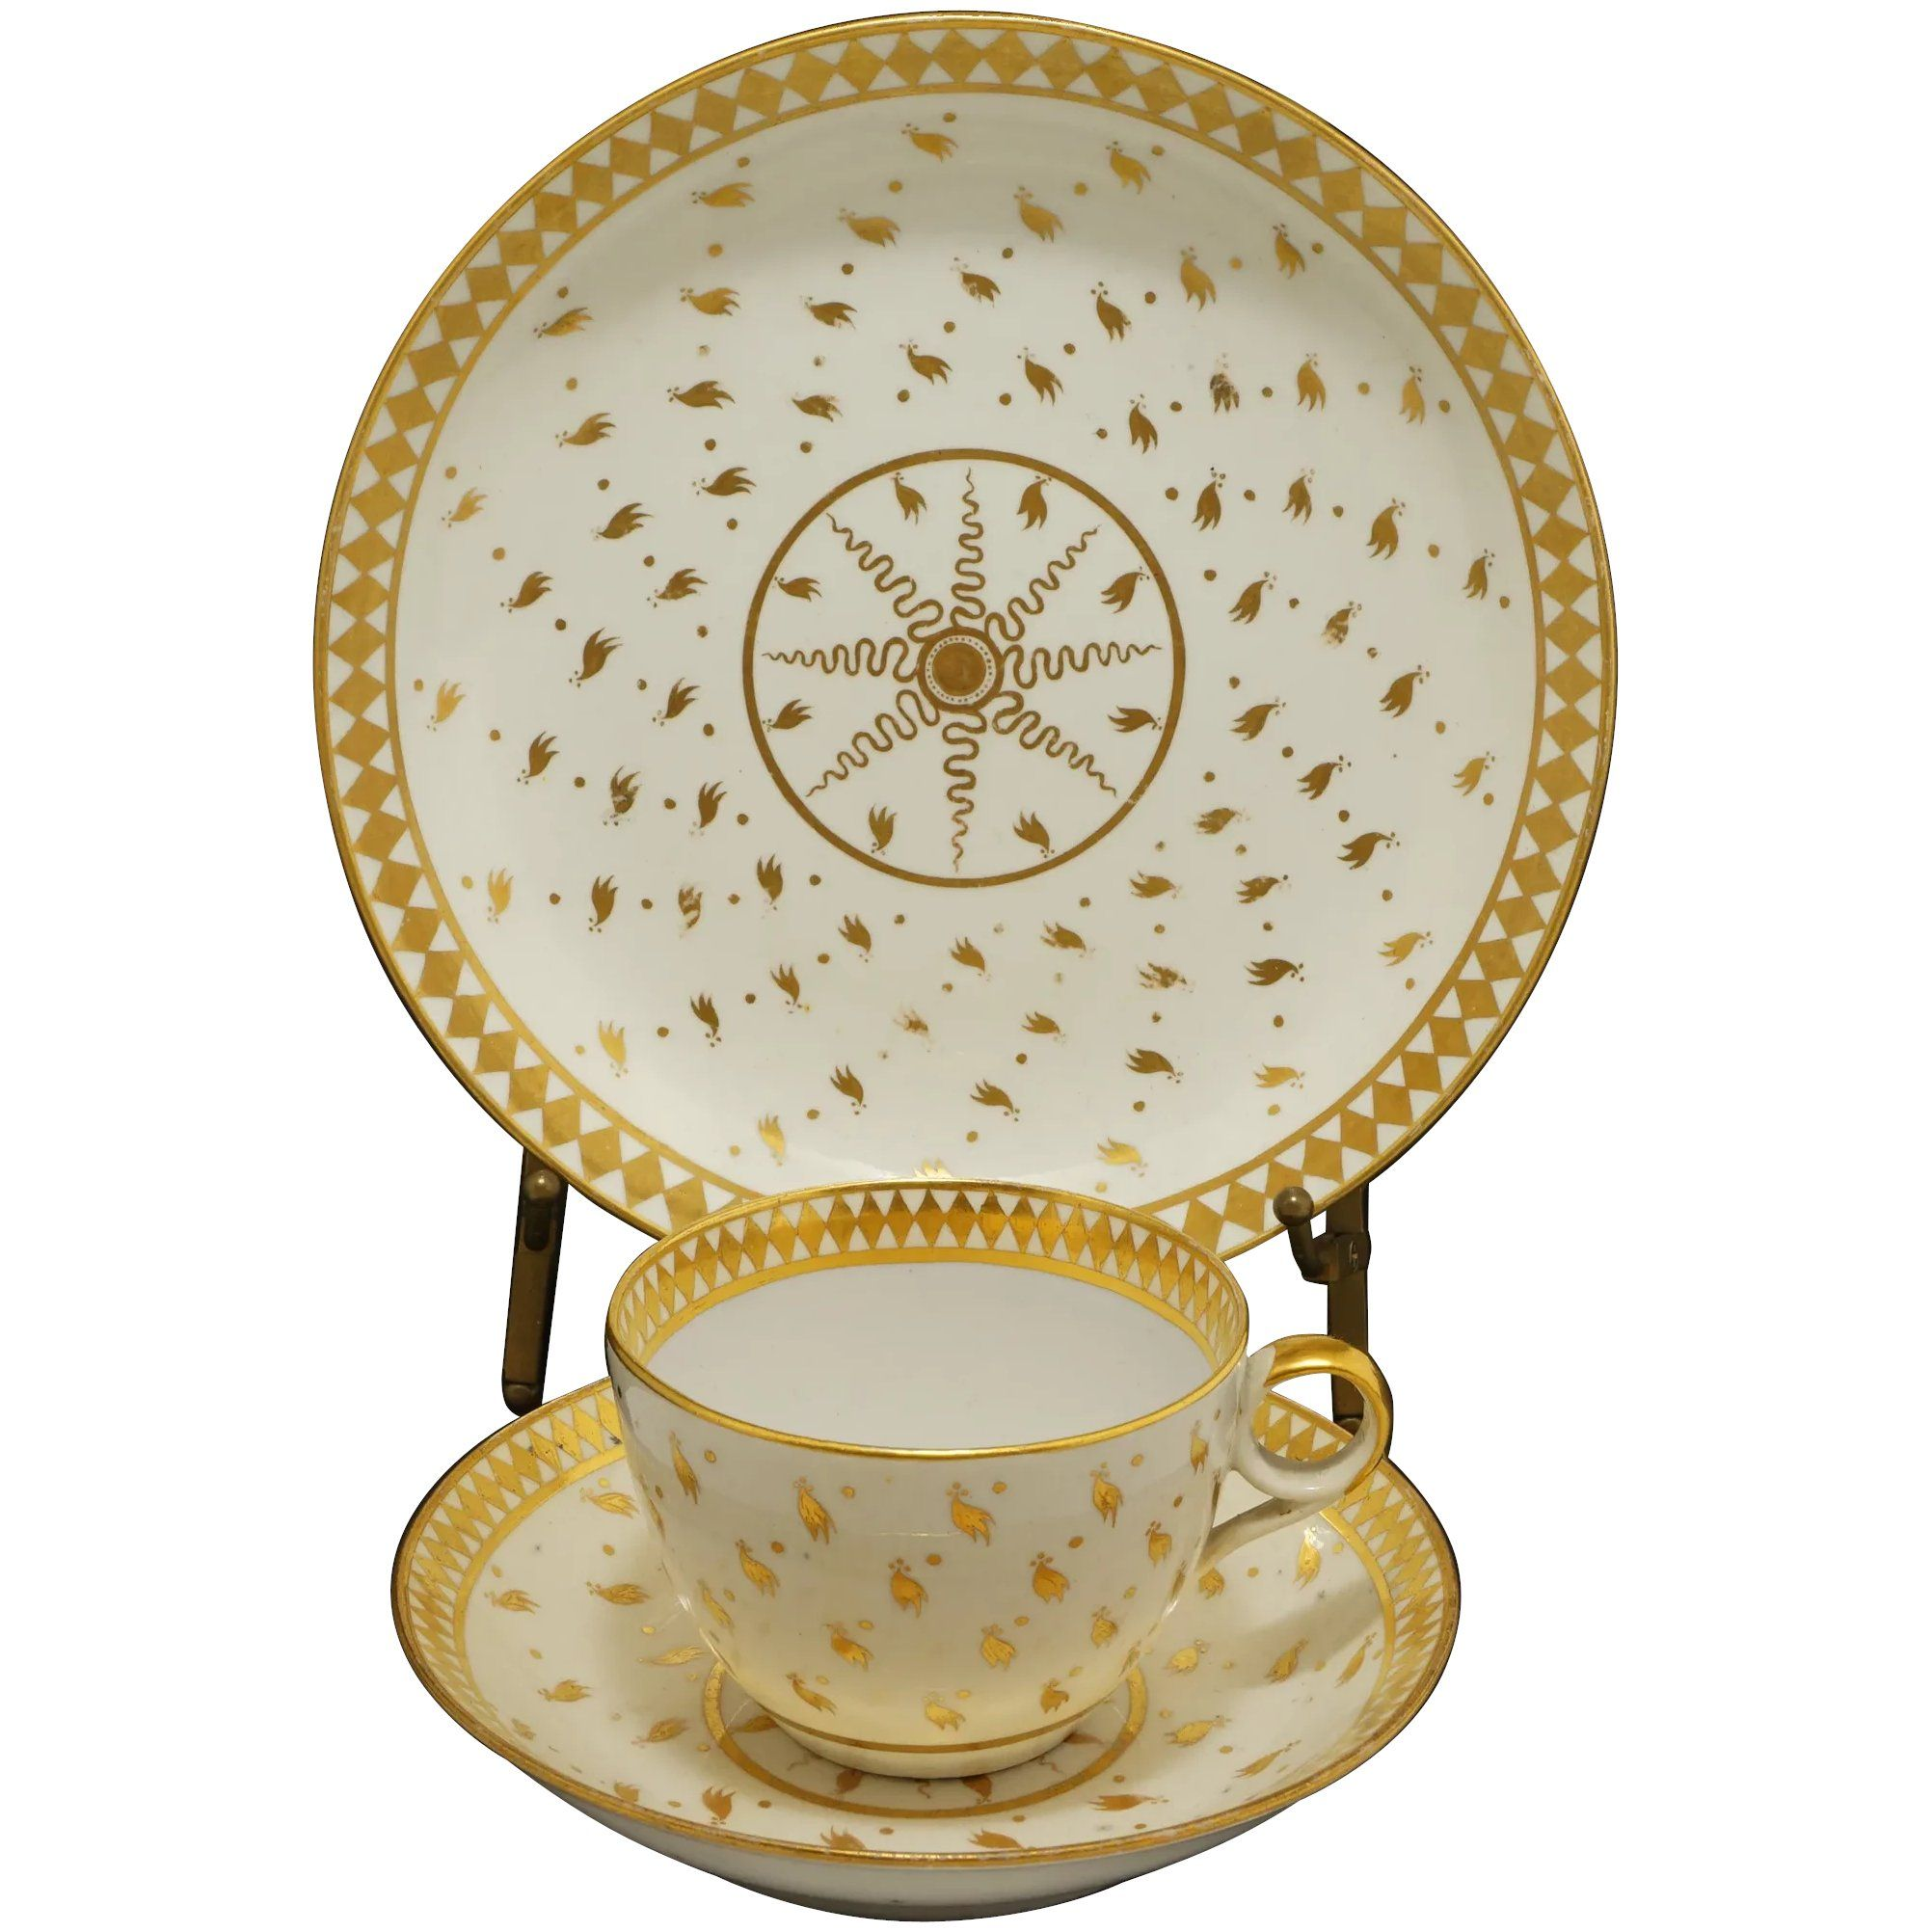 Georgian Spode Trio Hand Gilded Ermine Pattern Tea Cup Saucer Plate English Porcelain - pre 1833, England #teasets